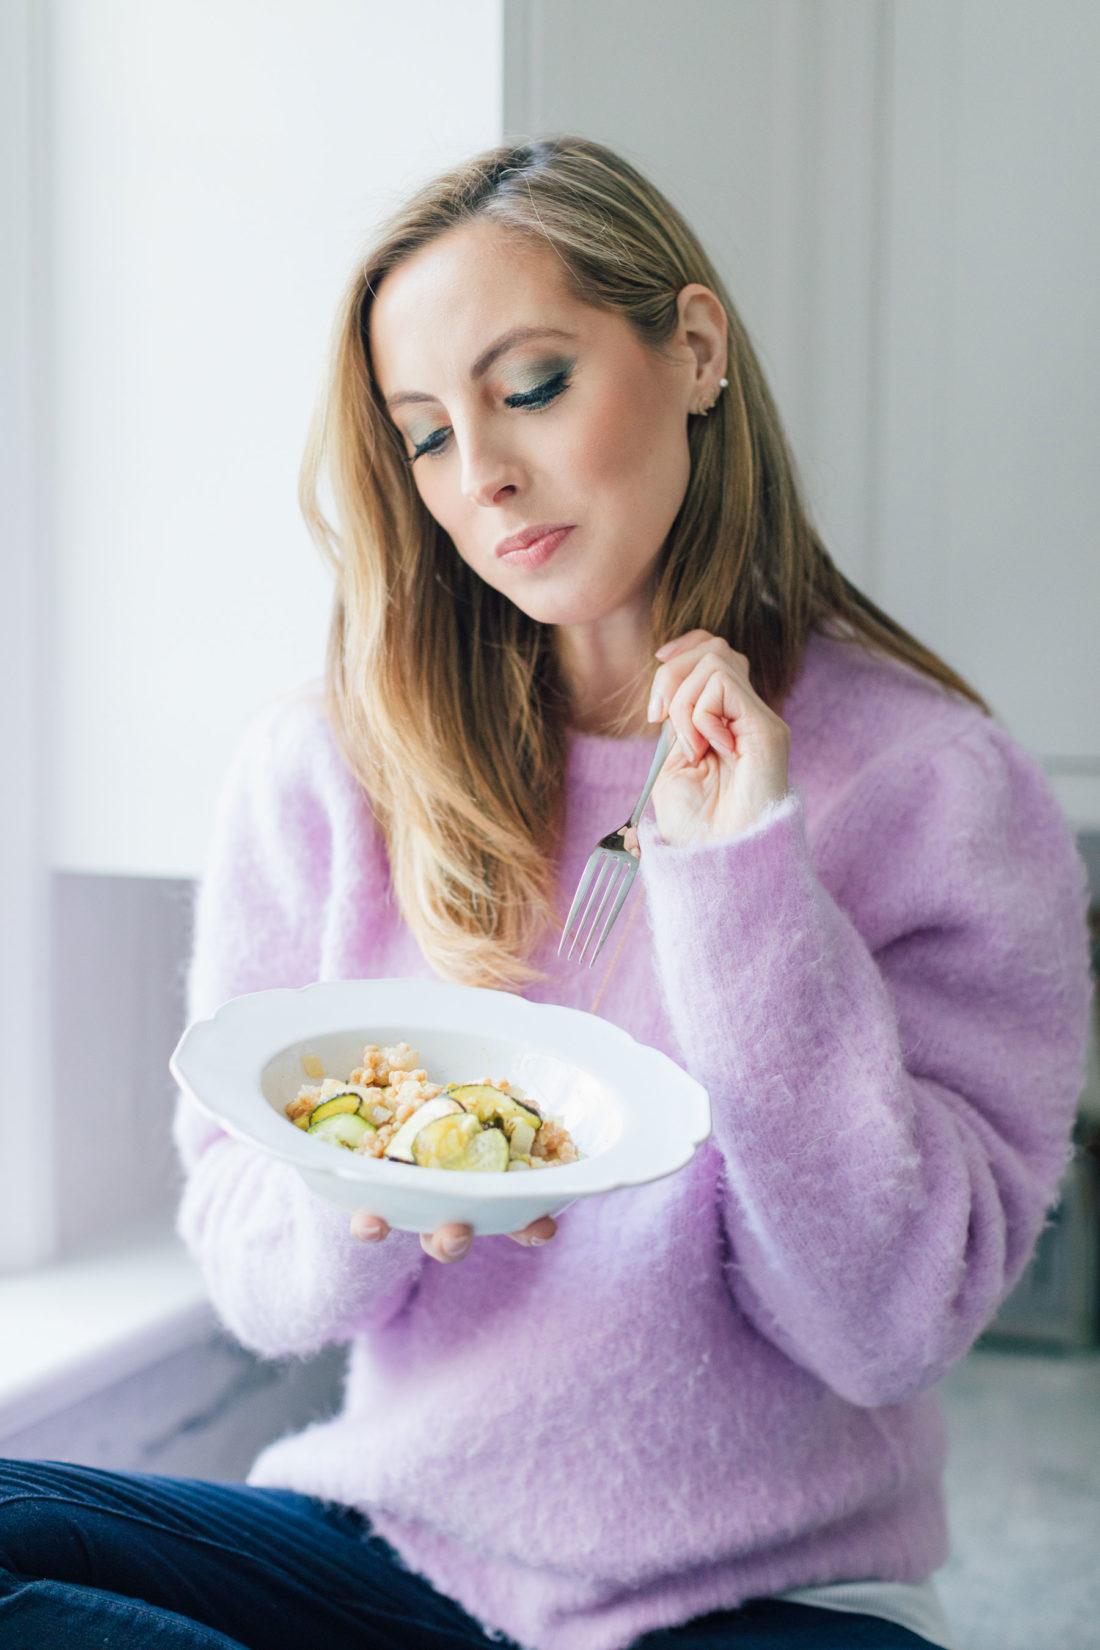 Eva Amurri shares a healthy veggie risotto recipe